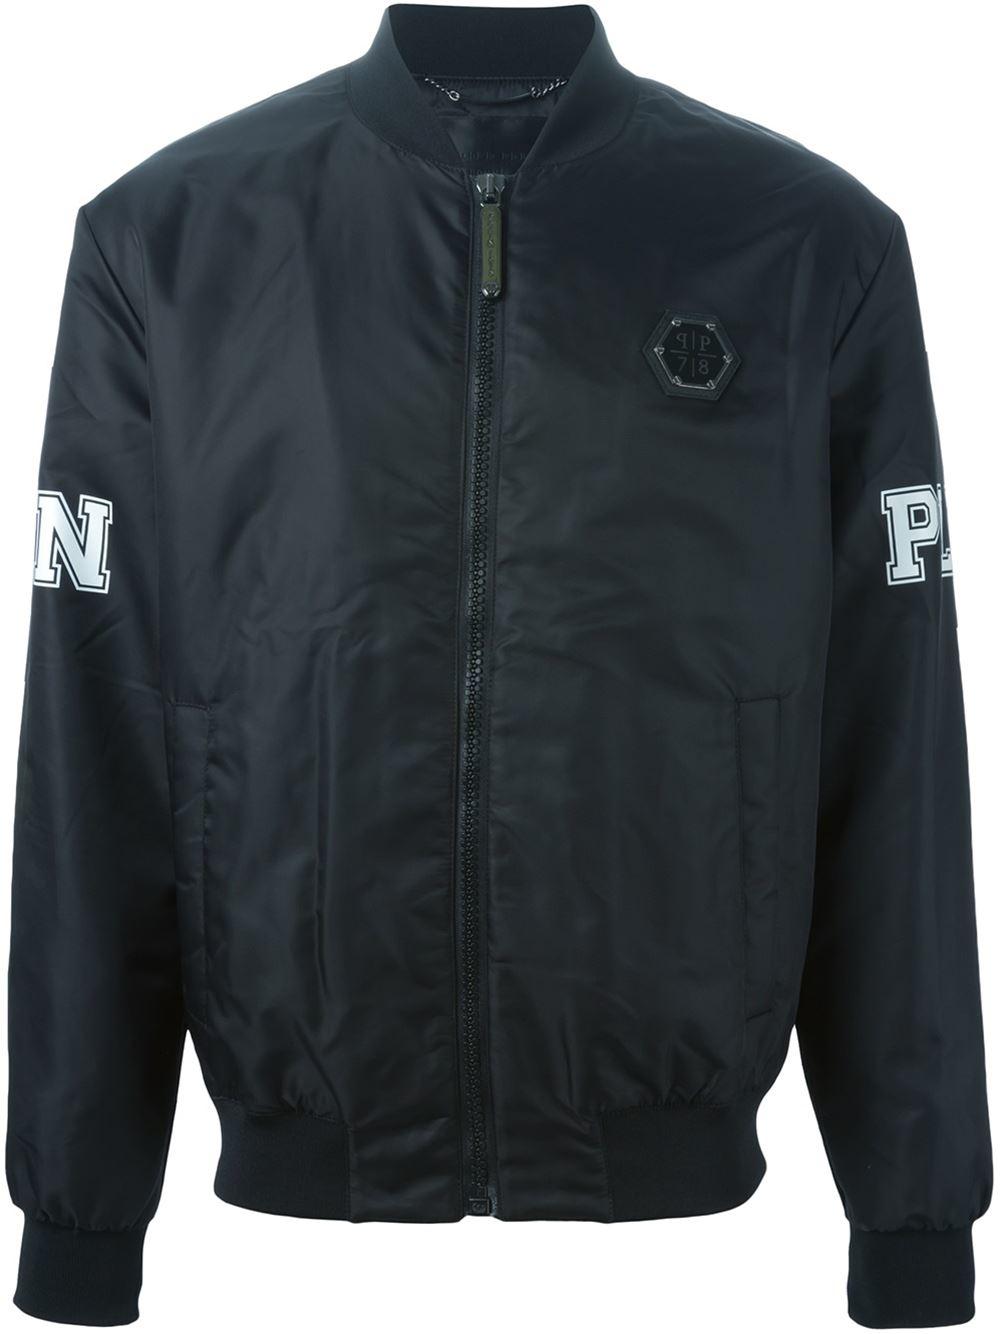 philipp plein 39 too bad 39 bomber jacket in black for men lyst. Black Bedroom Furniture Sets. Home Design Ideas